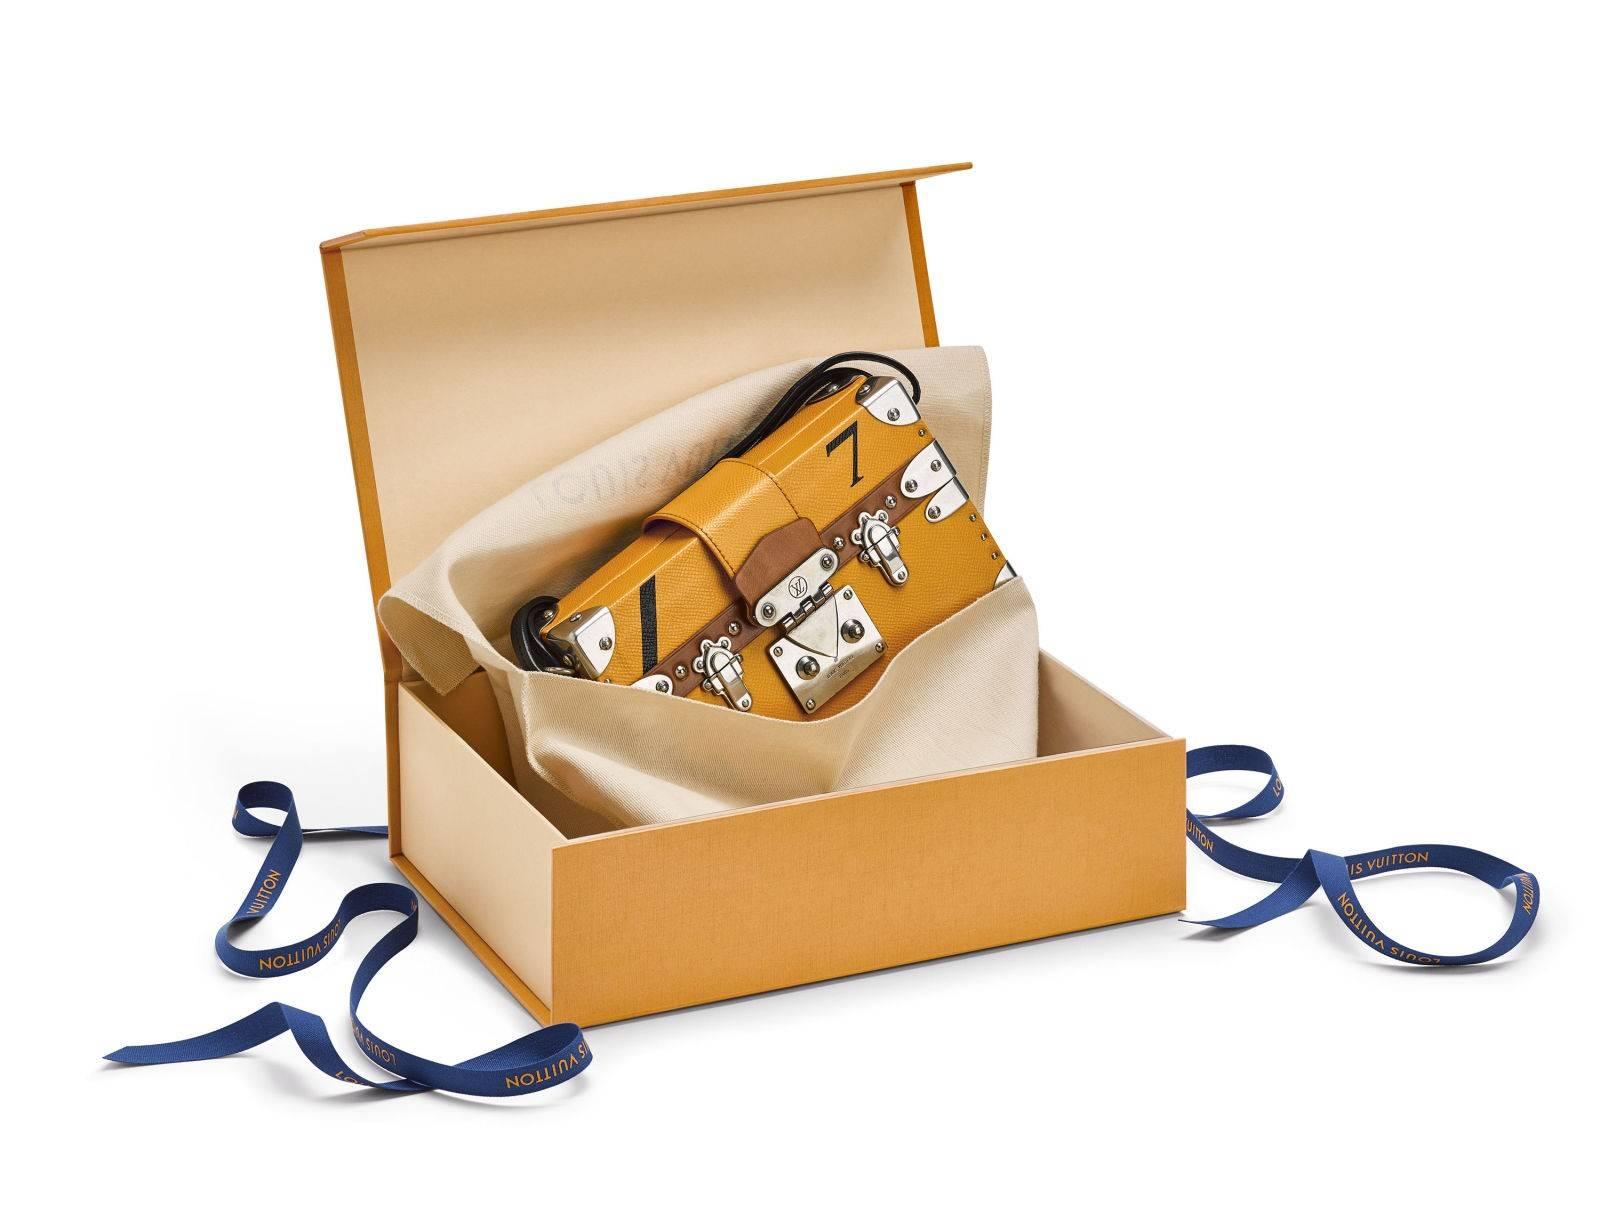 Oto nowe opakowania produktów Louis Vuitton w kolorze